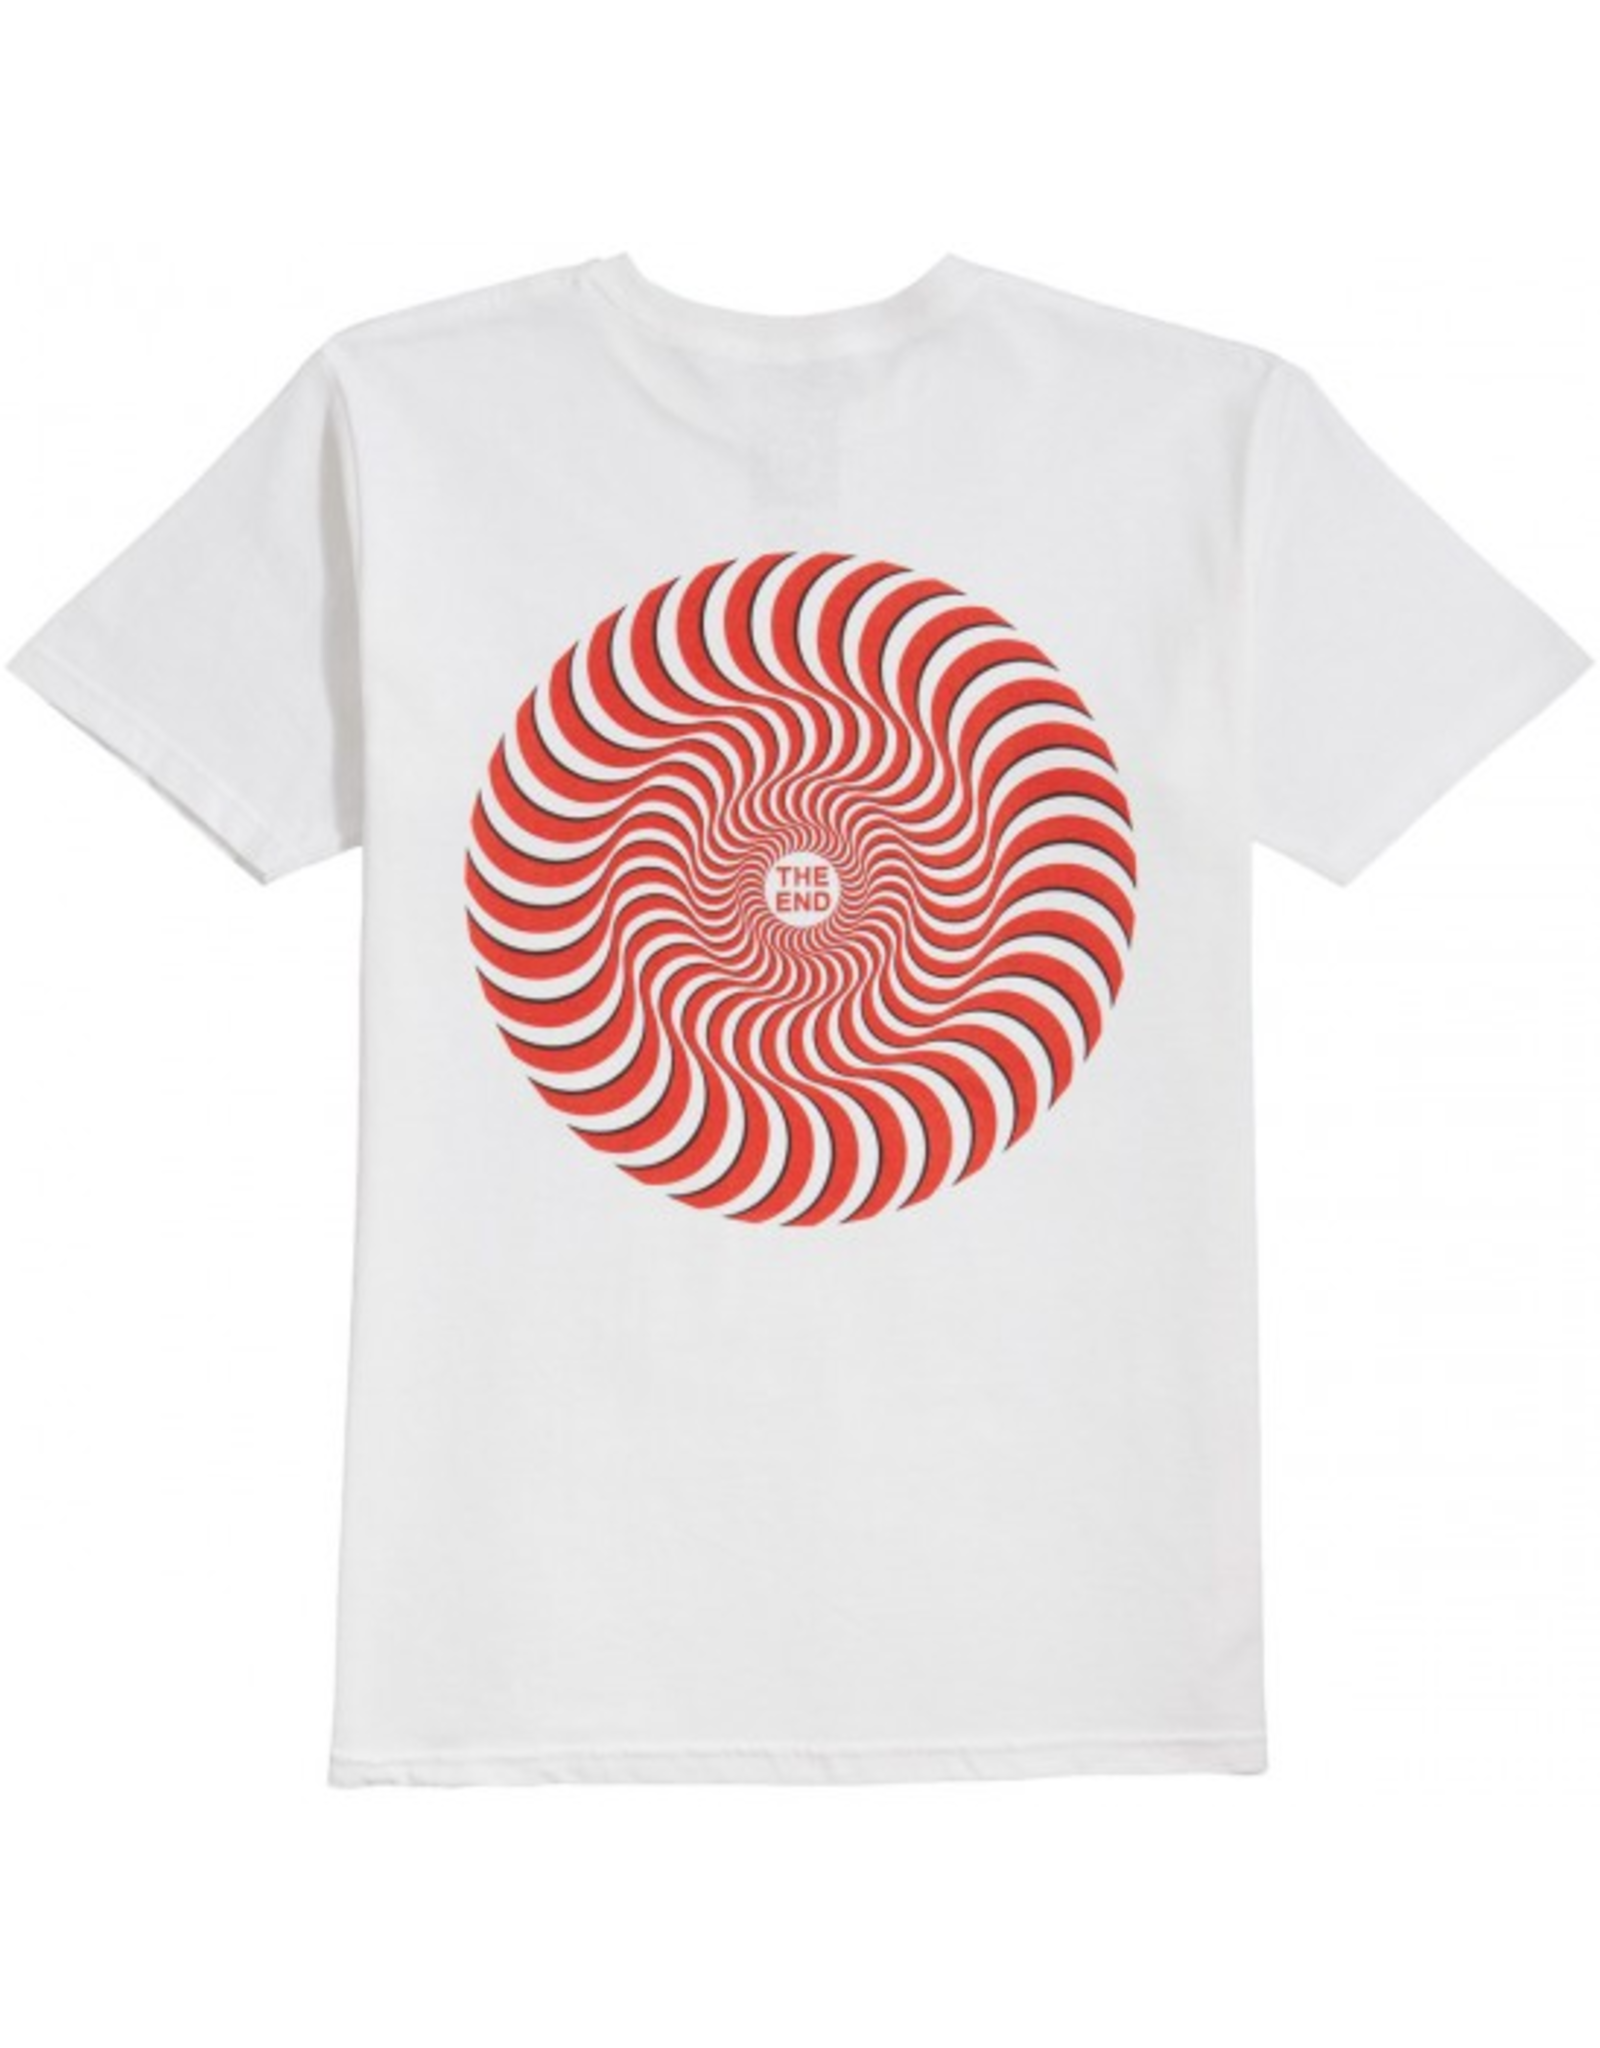 Spitfire Classic Swirl Overlay T-Shirt - White/Red